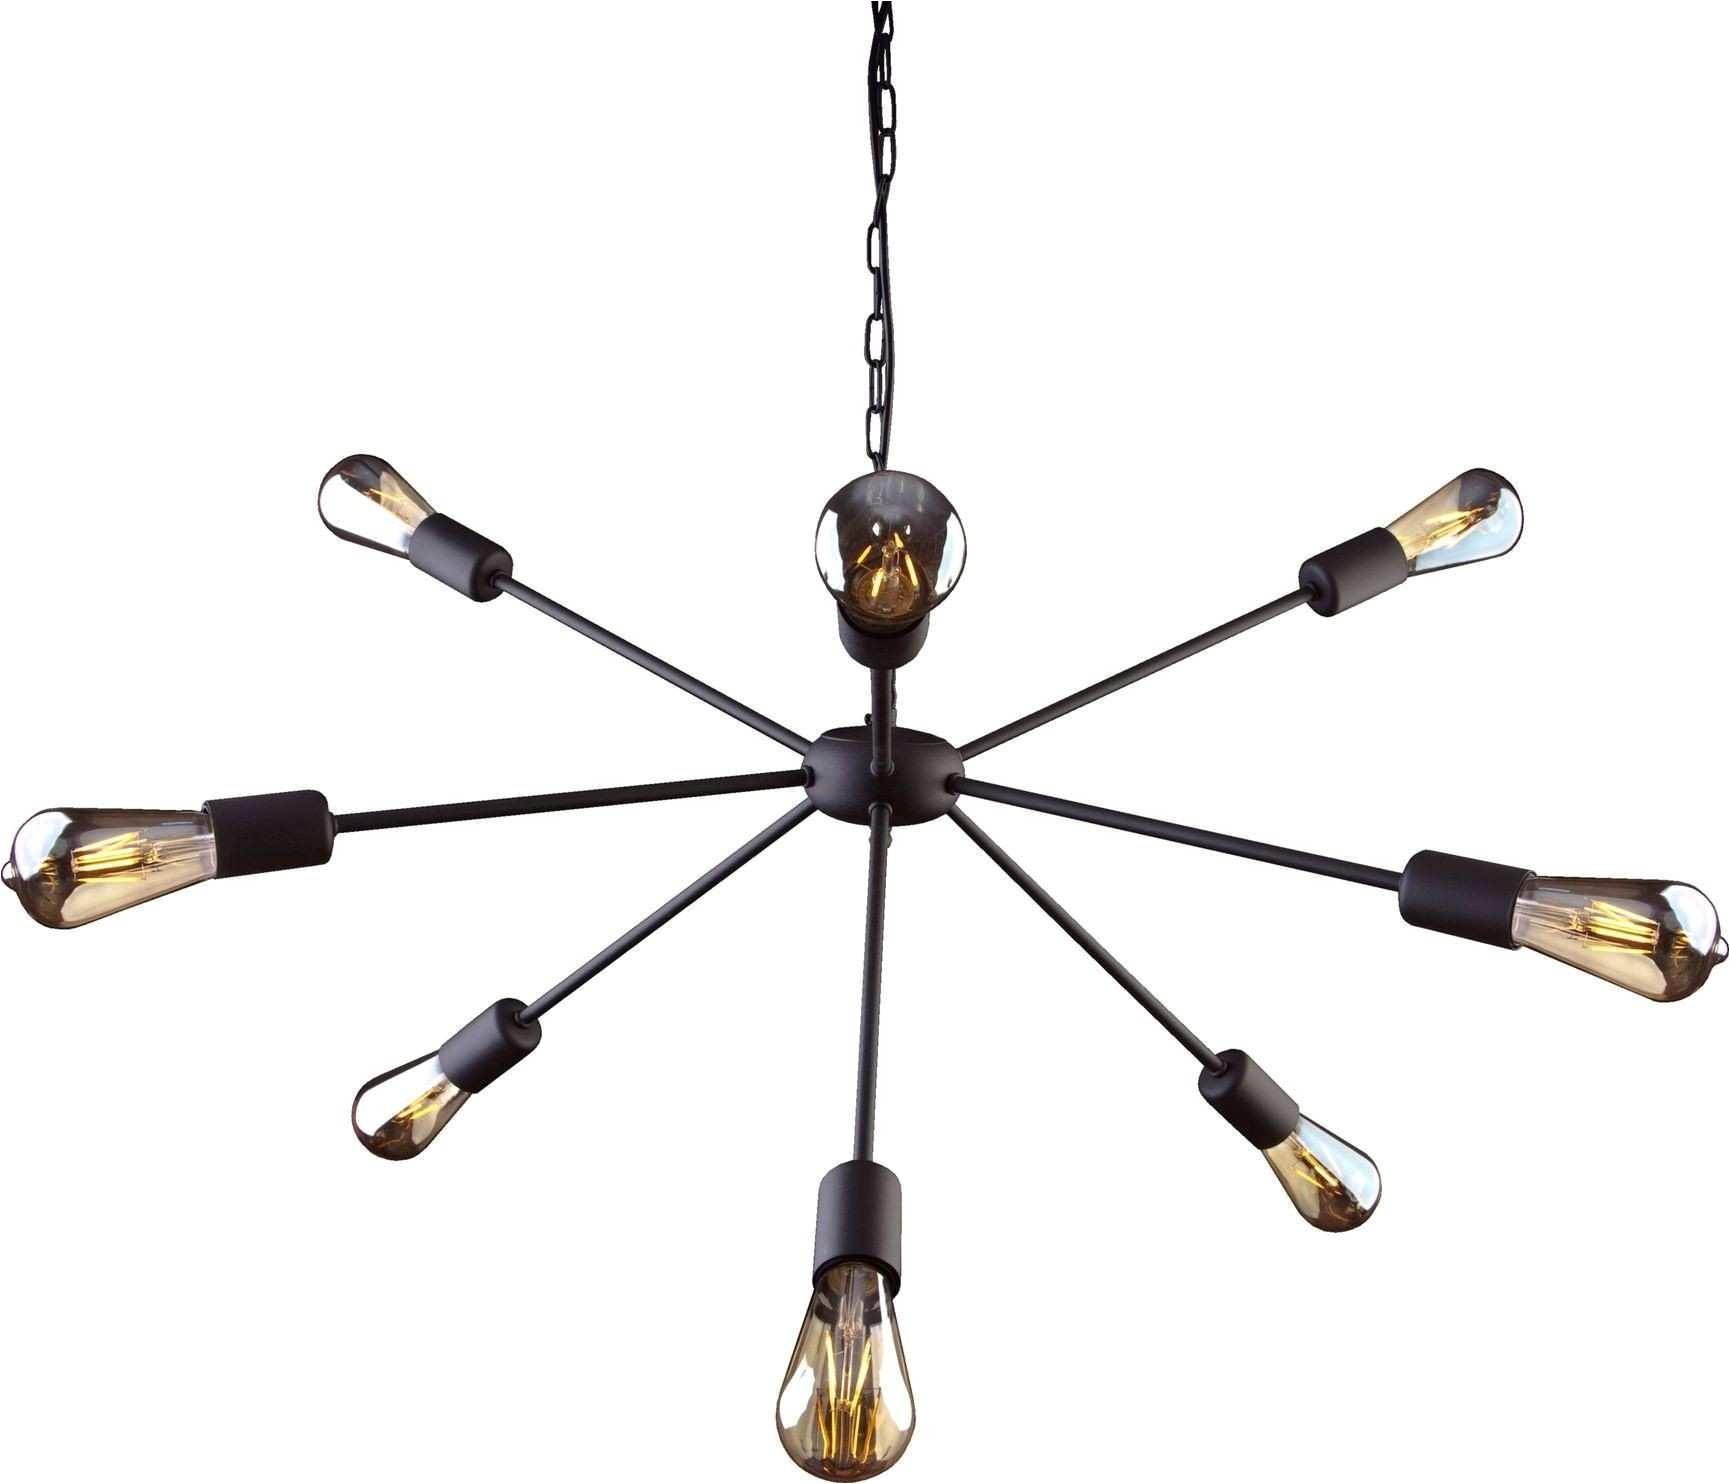 alluring best light bulbs for bathroom makeup and best light bulbs for bathroom vanity lovely nowodvorski rod 9734 od